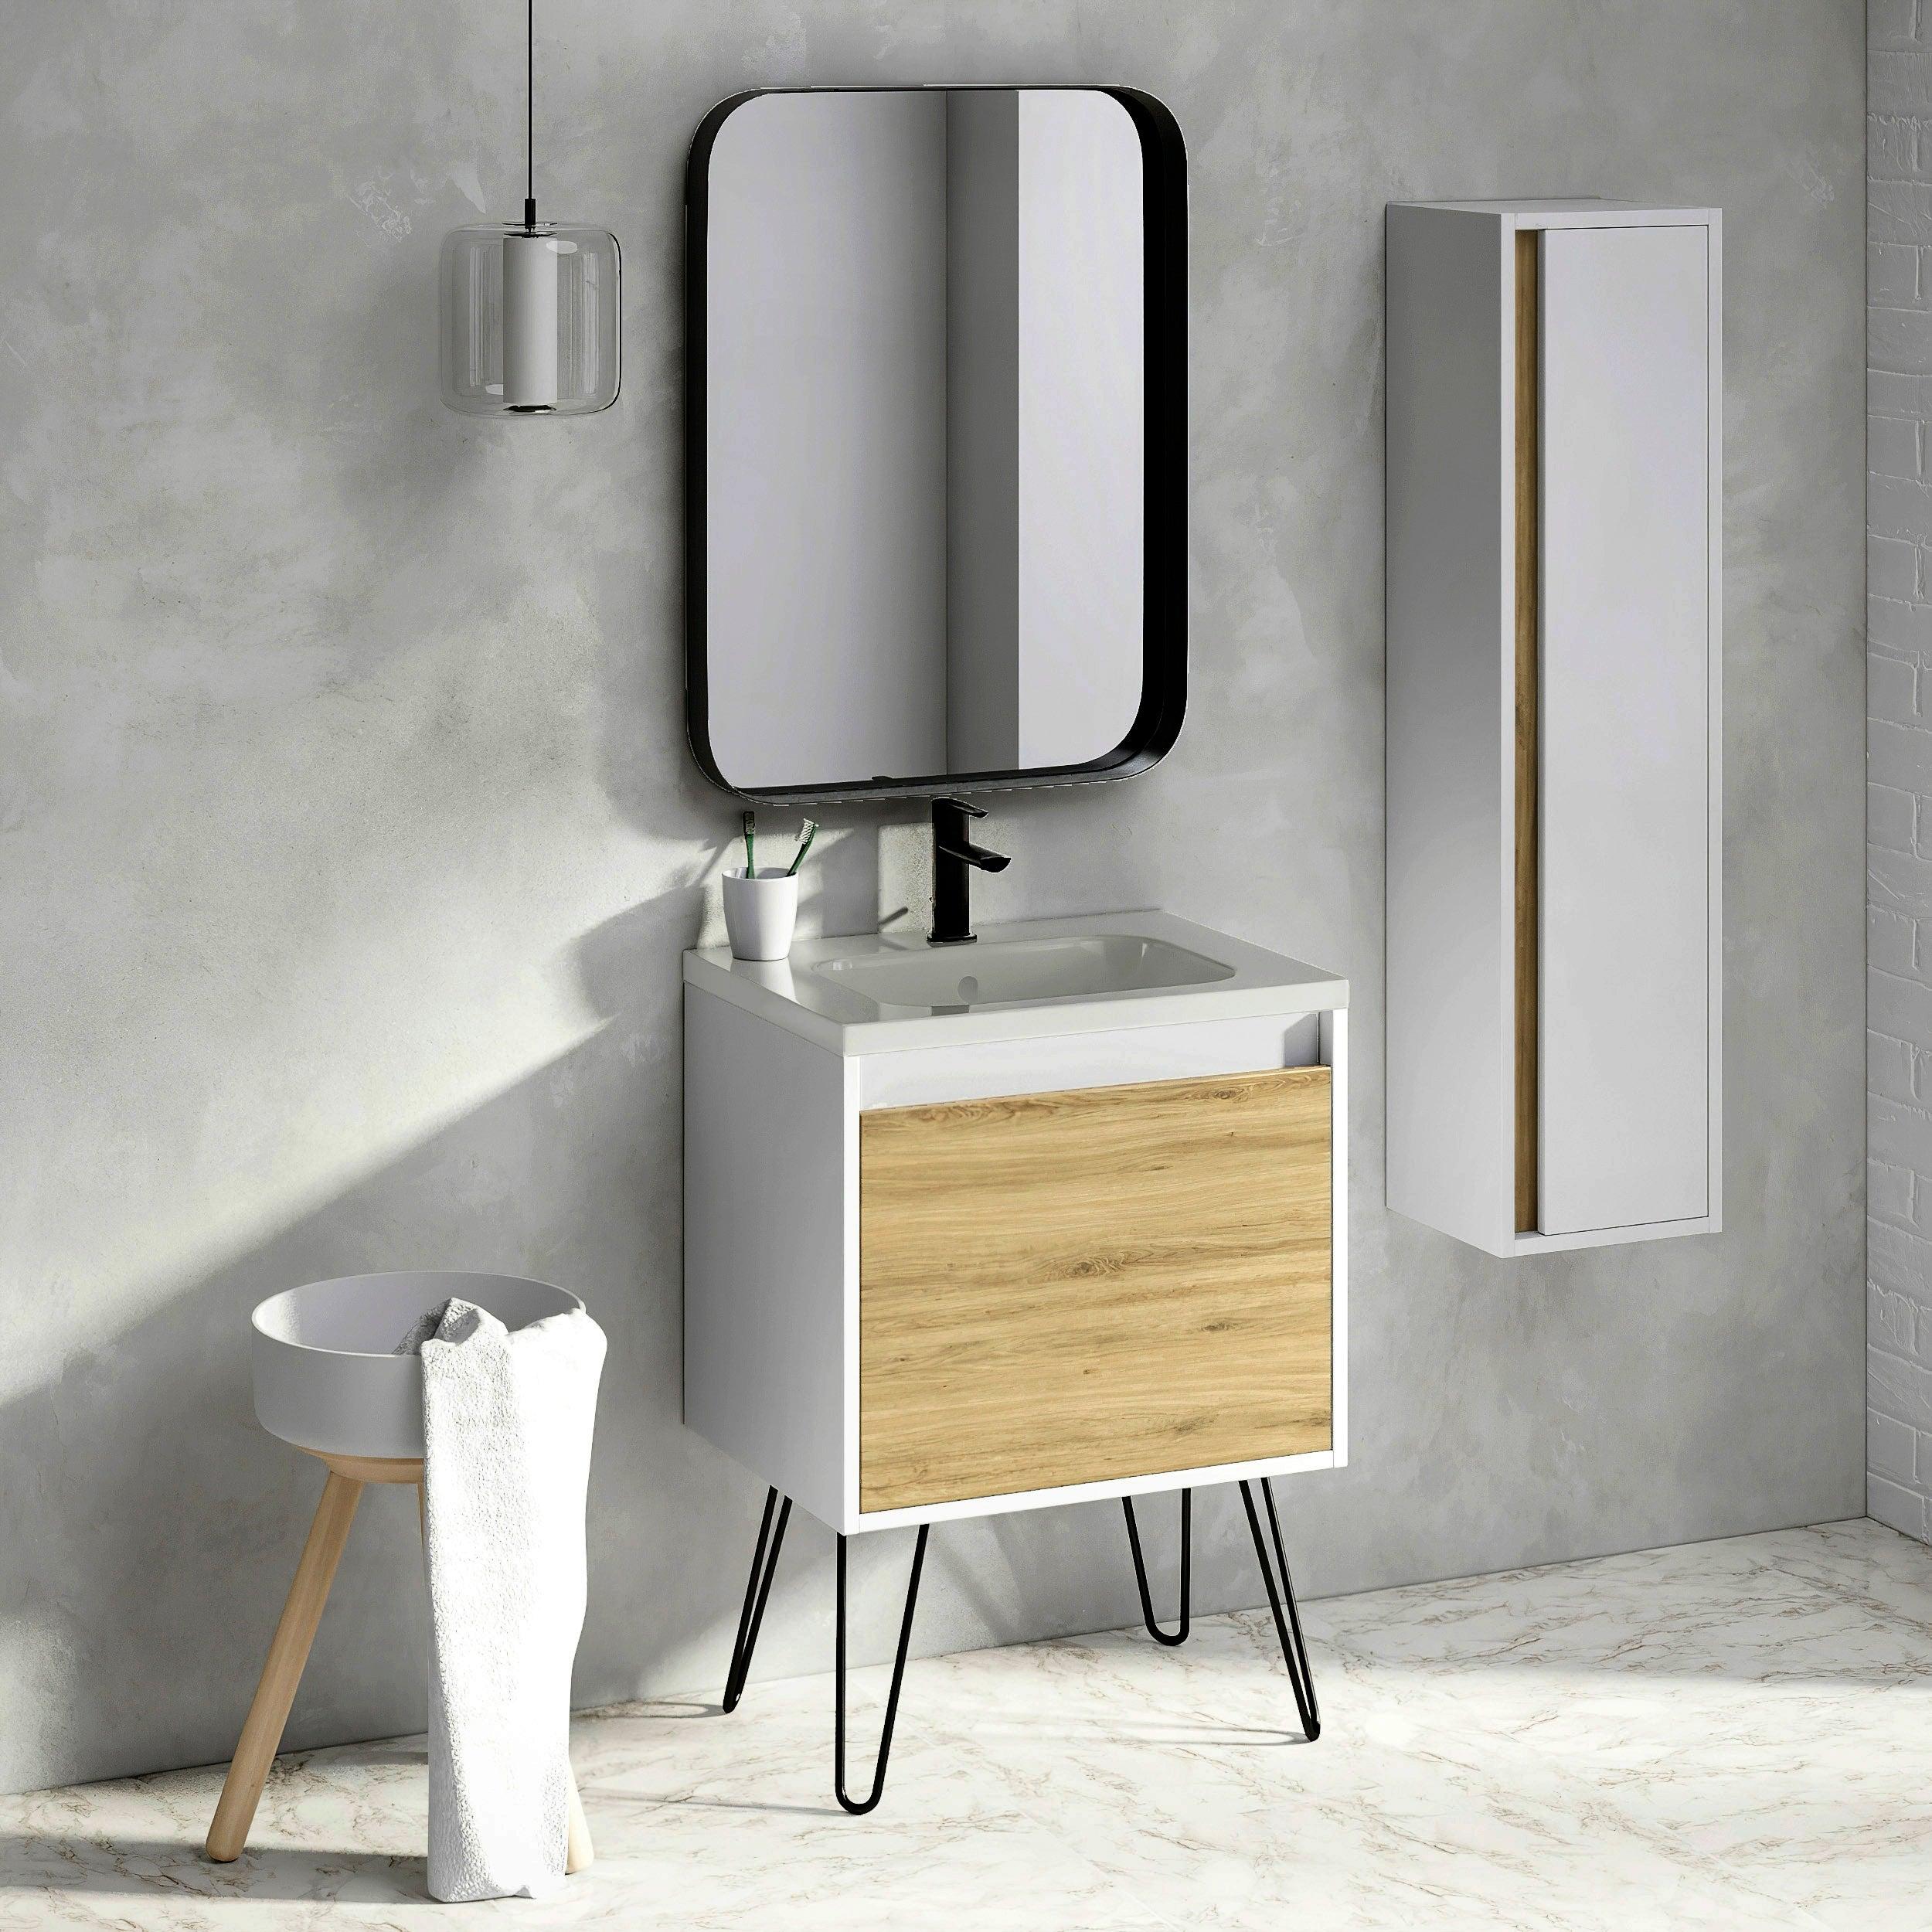 24 Bathroom Vanity Cabinet Legs Ceramic Sink Set Tribeca Fs W 24 X H 35 X D 18 In Wf440 Ginger Overstock 31624091